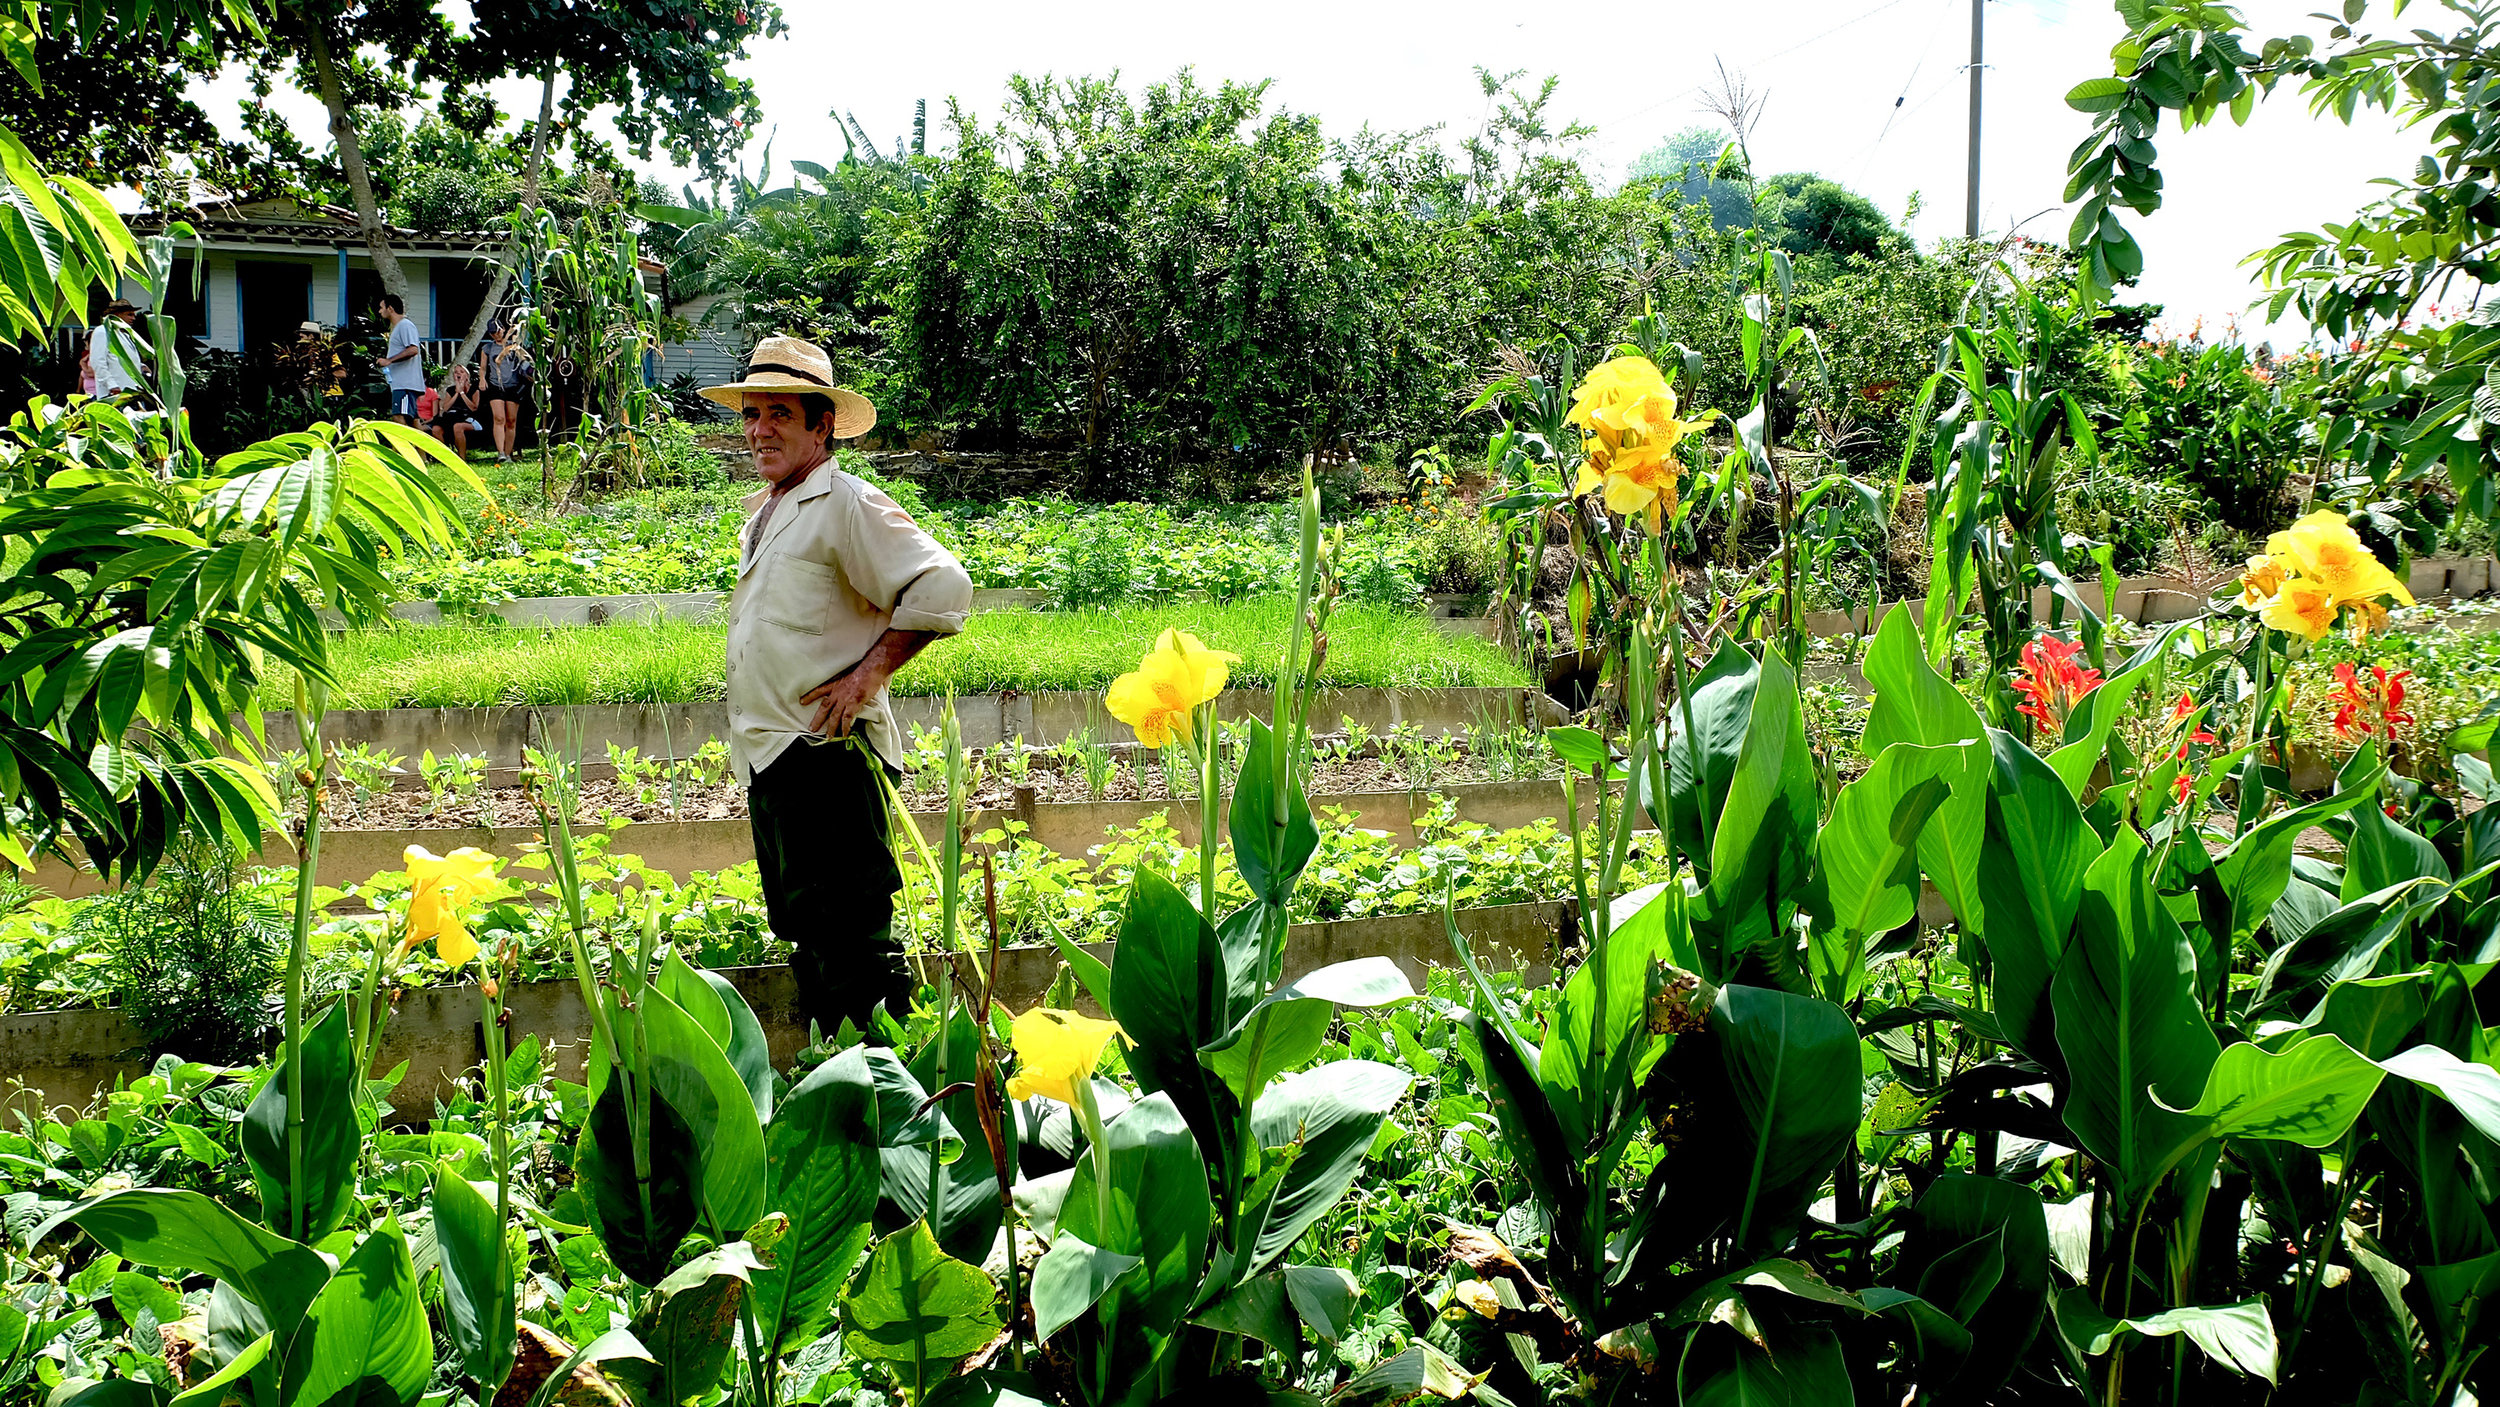 Cuba-Farm-Man.jpg